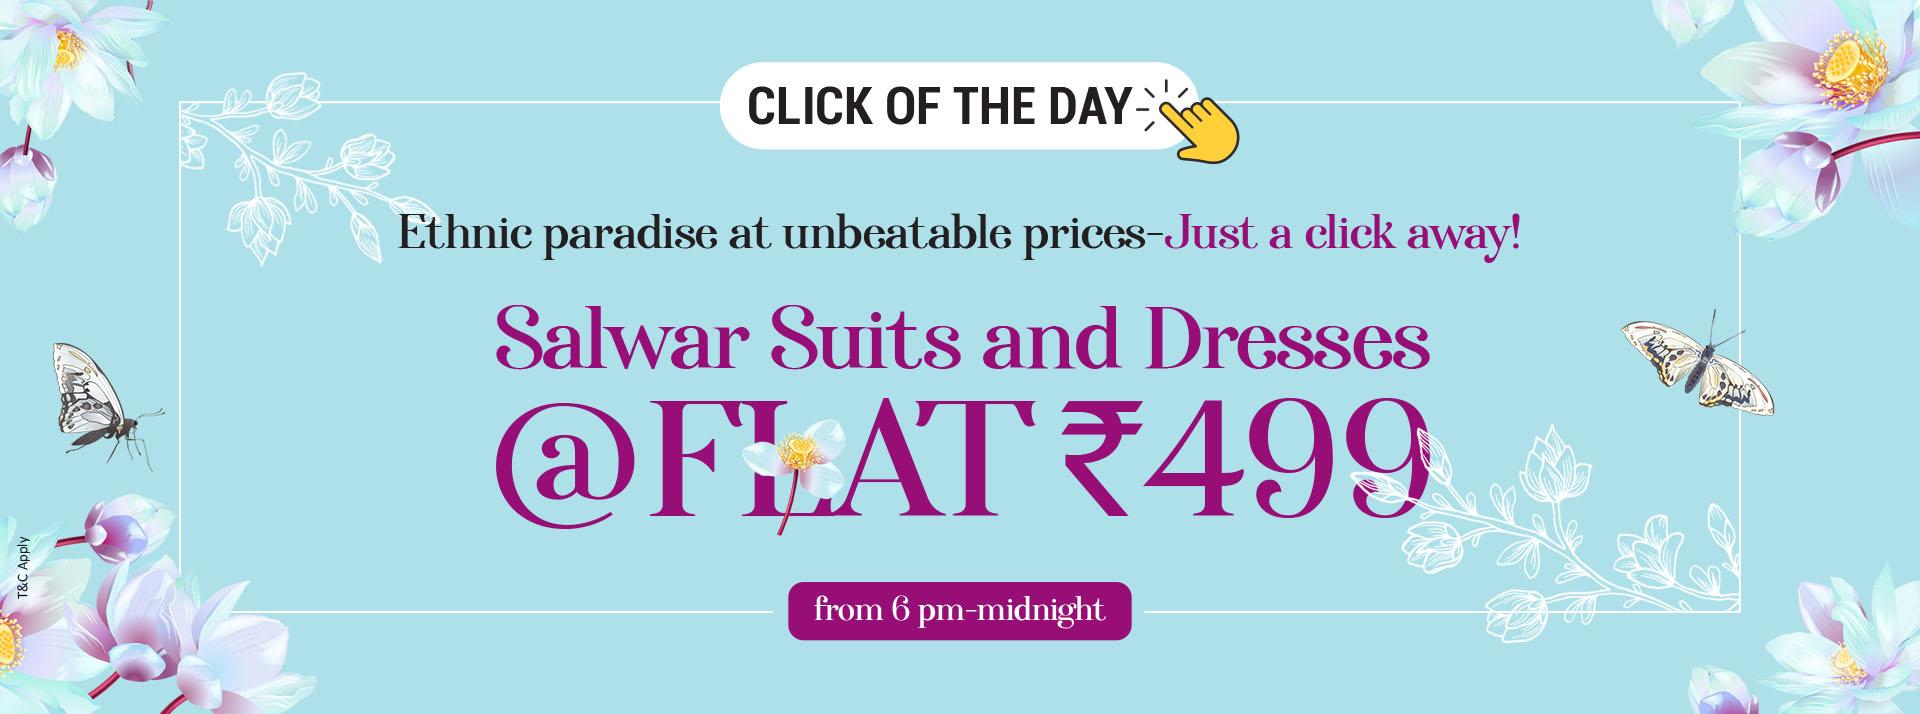 Salwar Suits & Dresses Flat 499